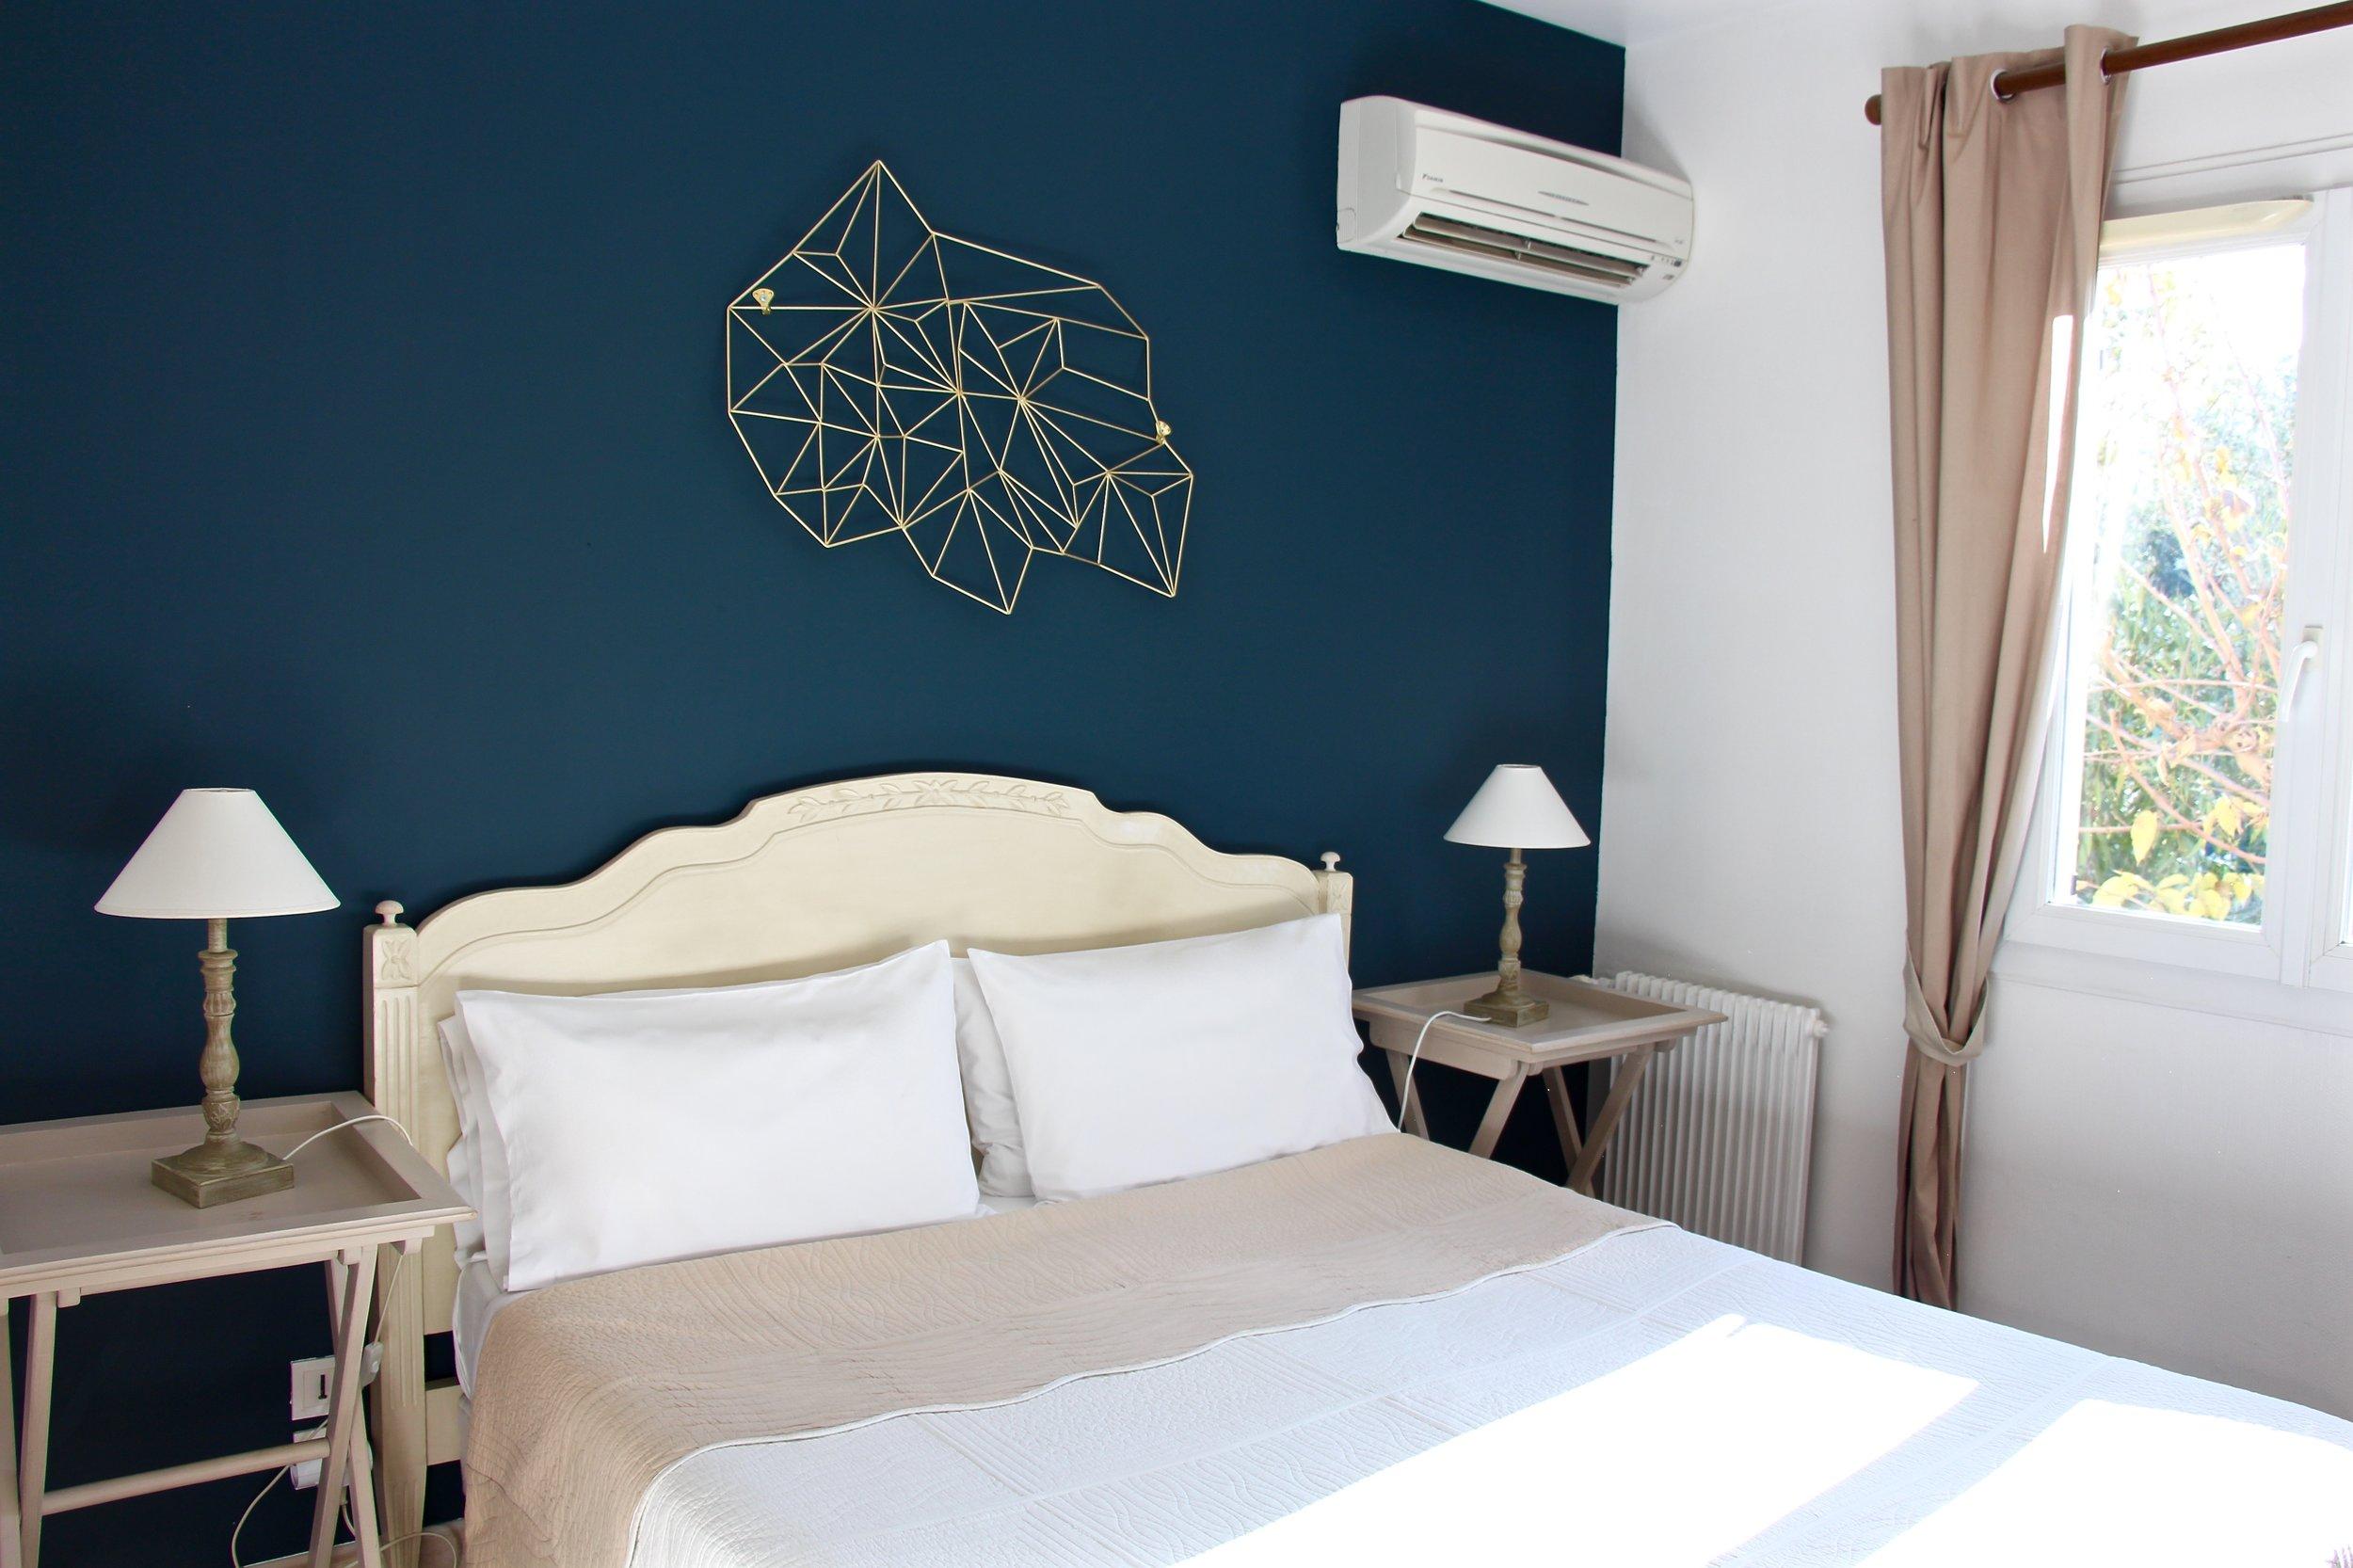 room5 color2.jpg